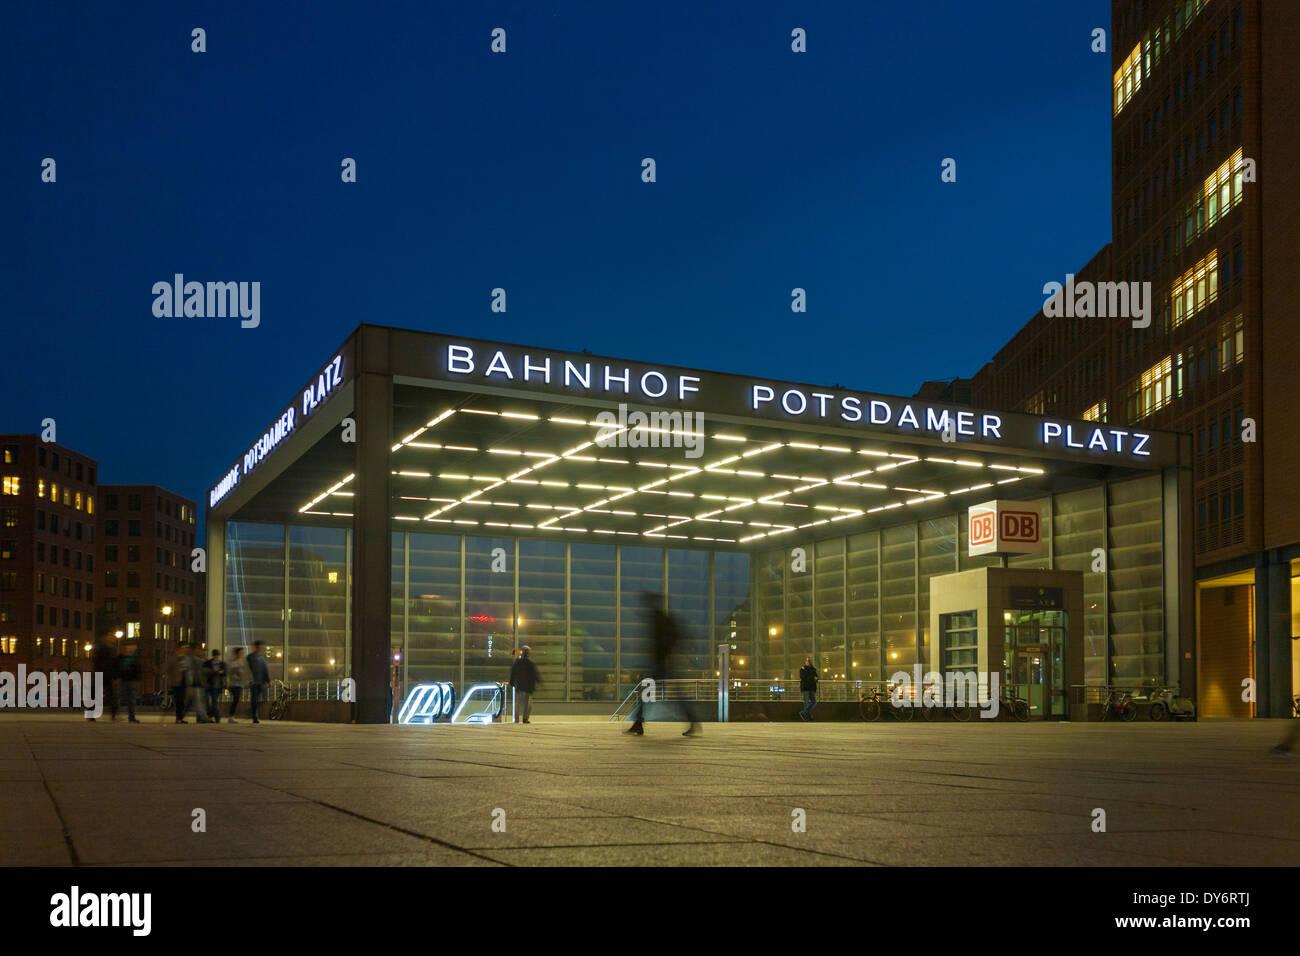 Train station Potsdamer Platz Tiergarten, Berlin, Germany - Stock Image